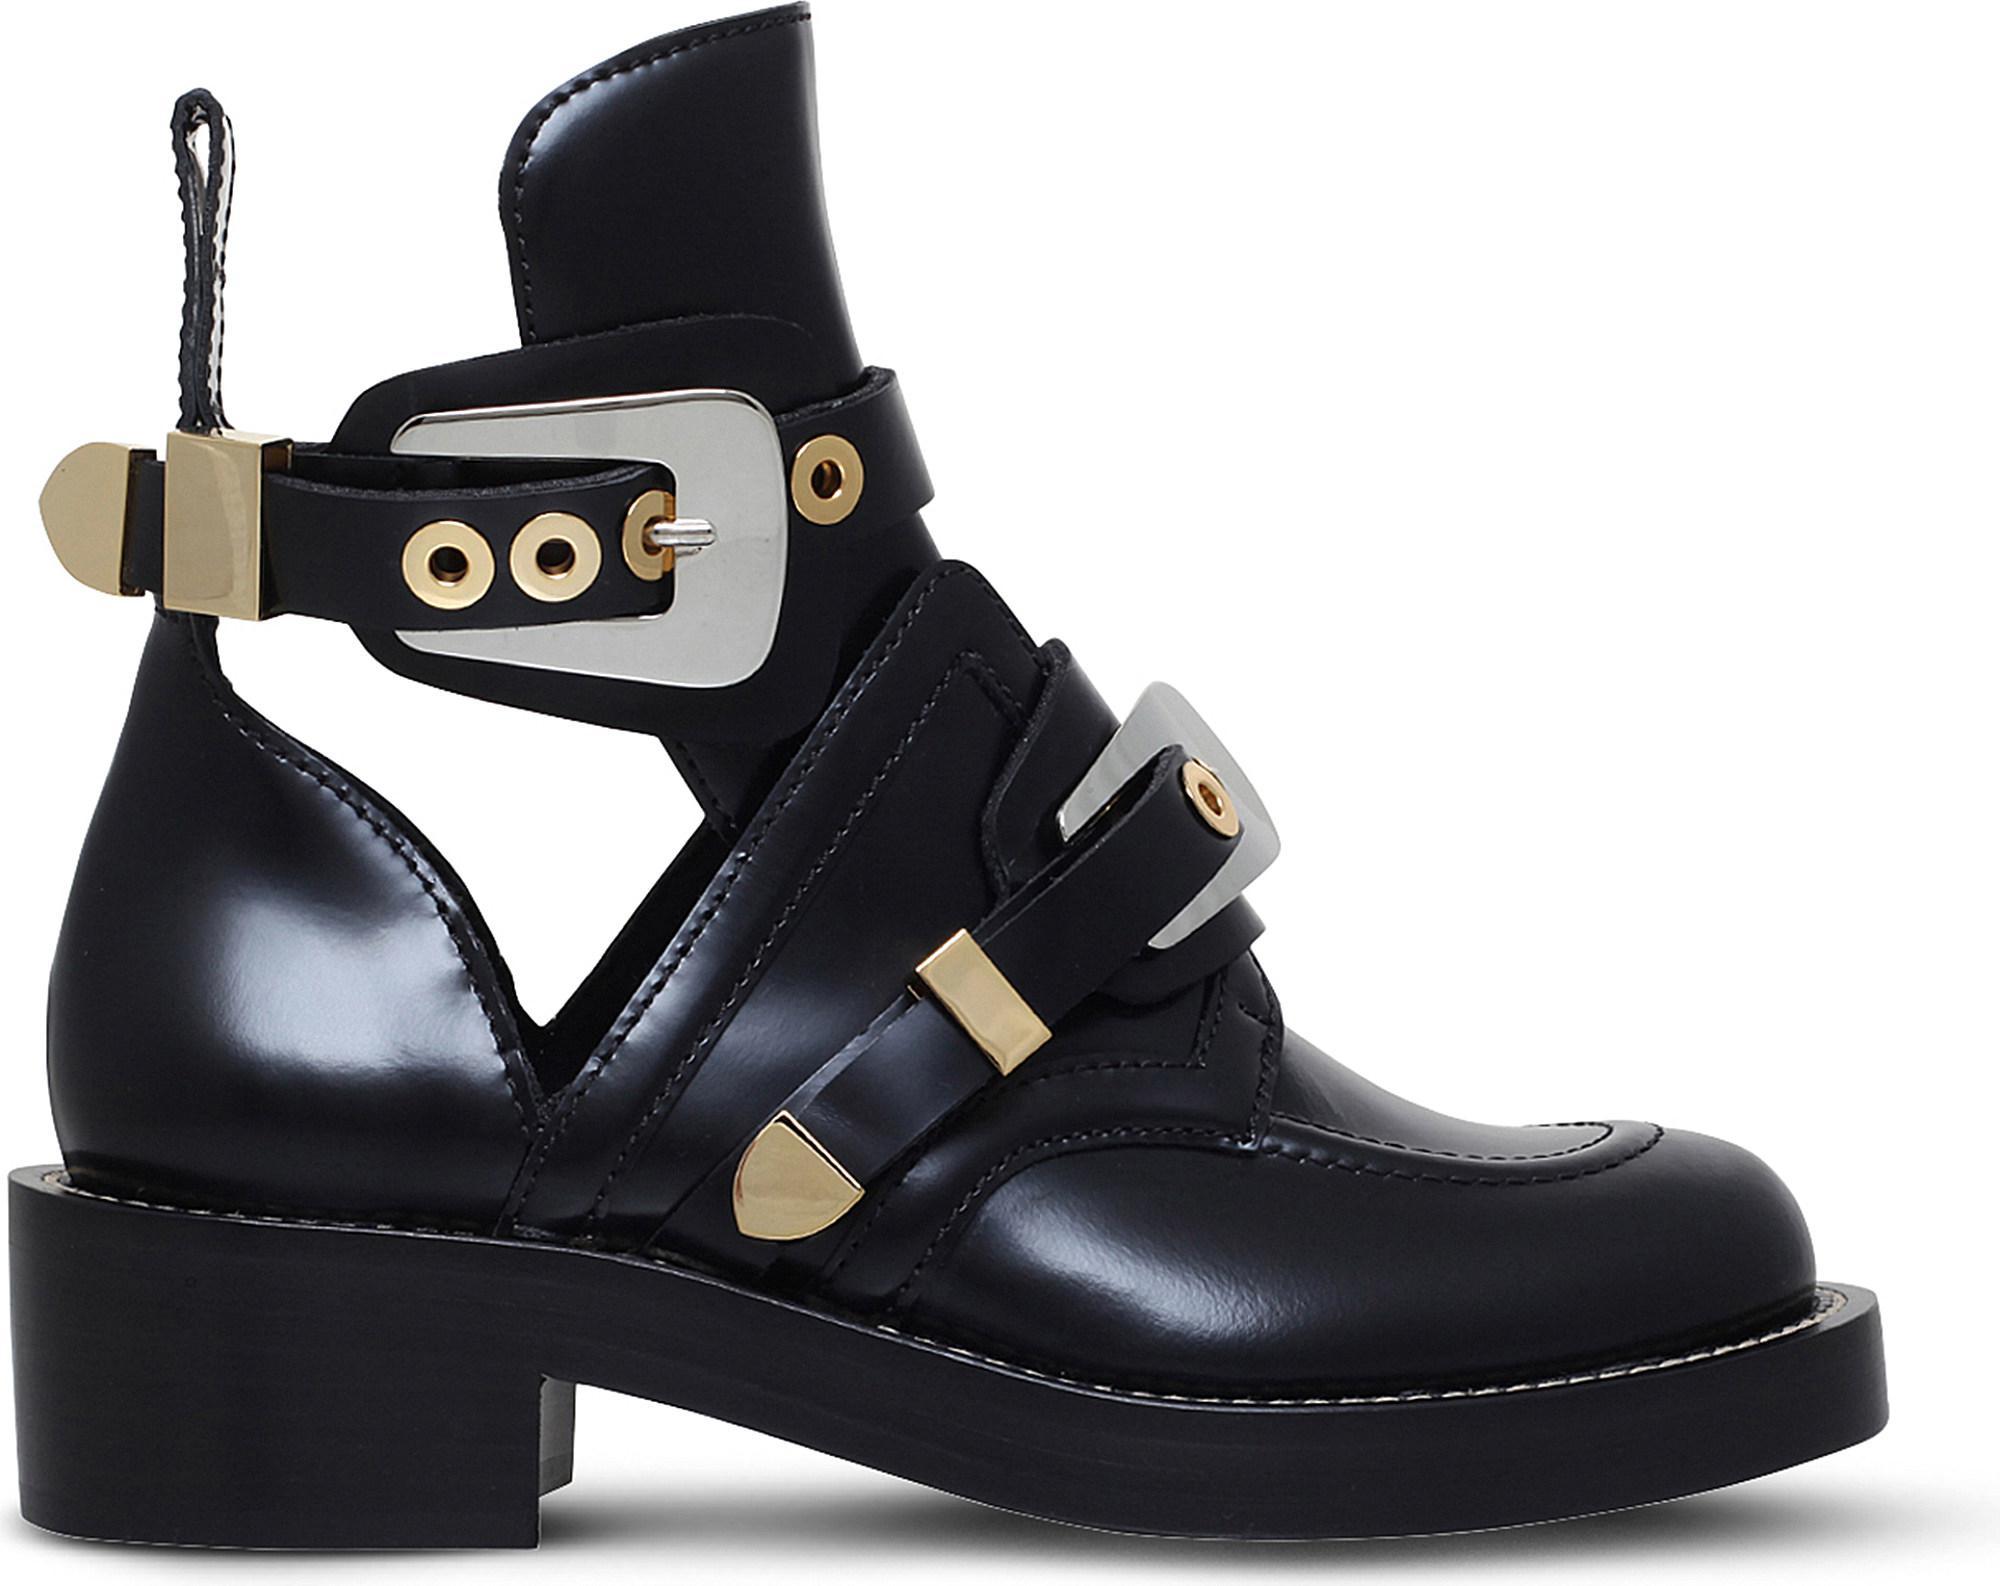 7a63f176ae35 Lyst - Balenciaga Women s Ceinture Ankle Boots in Blue - Save 40%